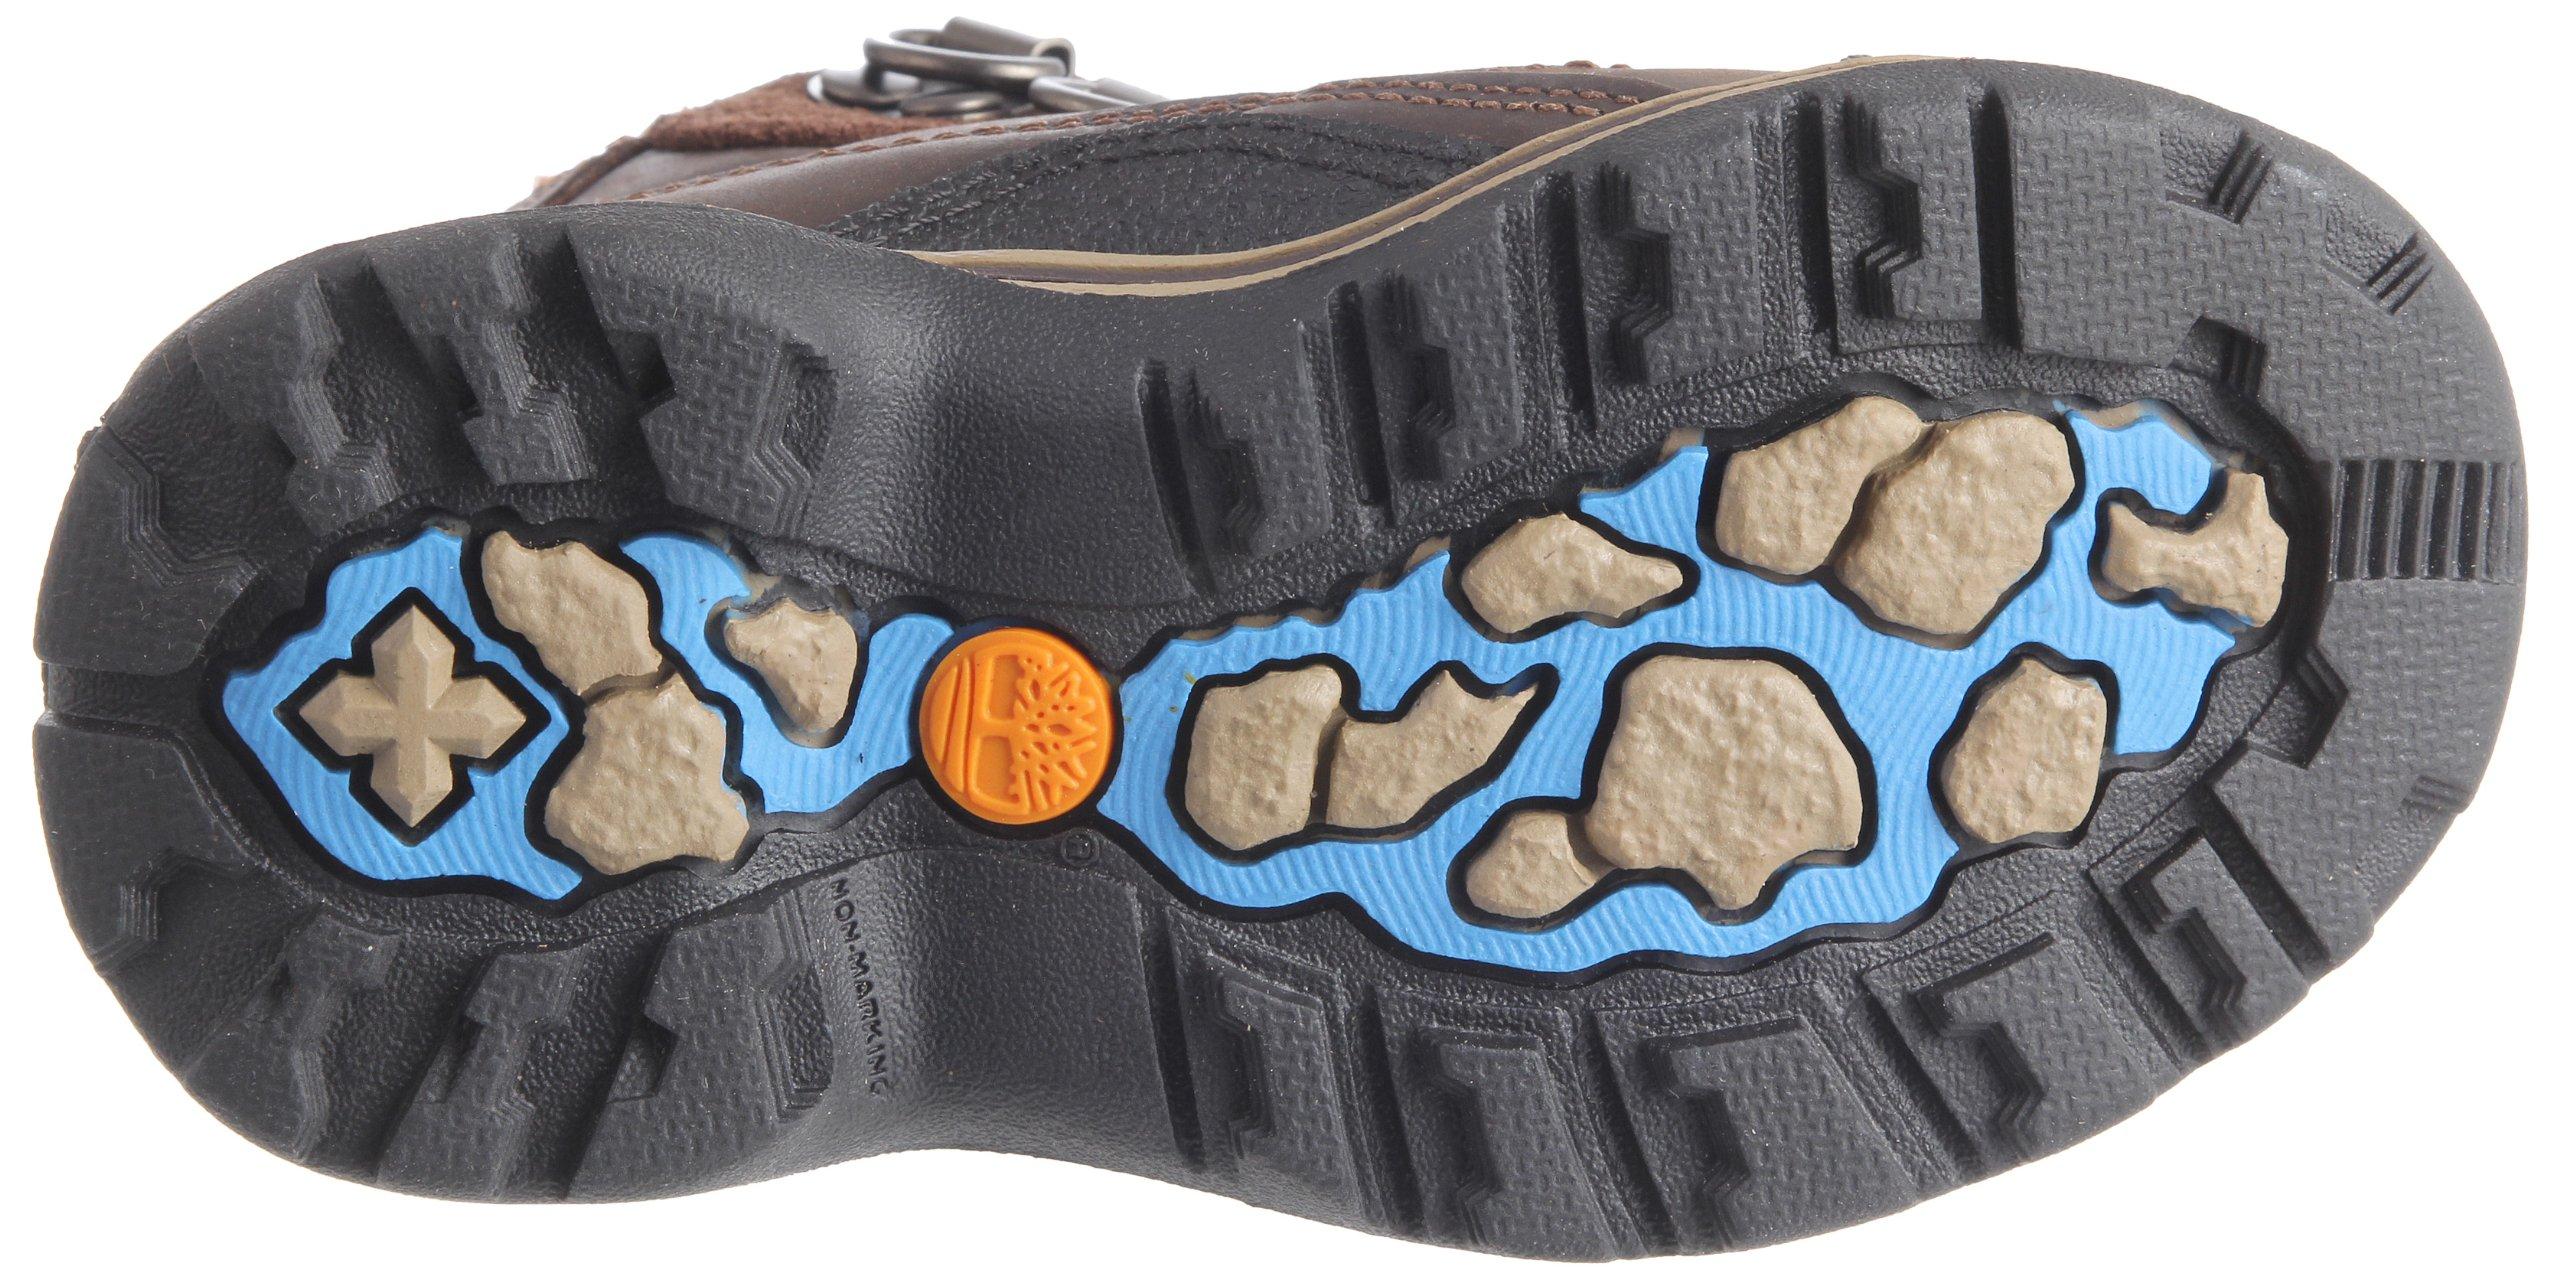 Timberland Pawtuckaway, Unisex-Child Hiking Shoes 3